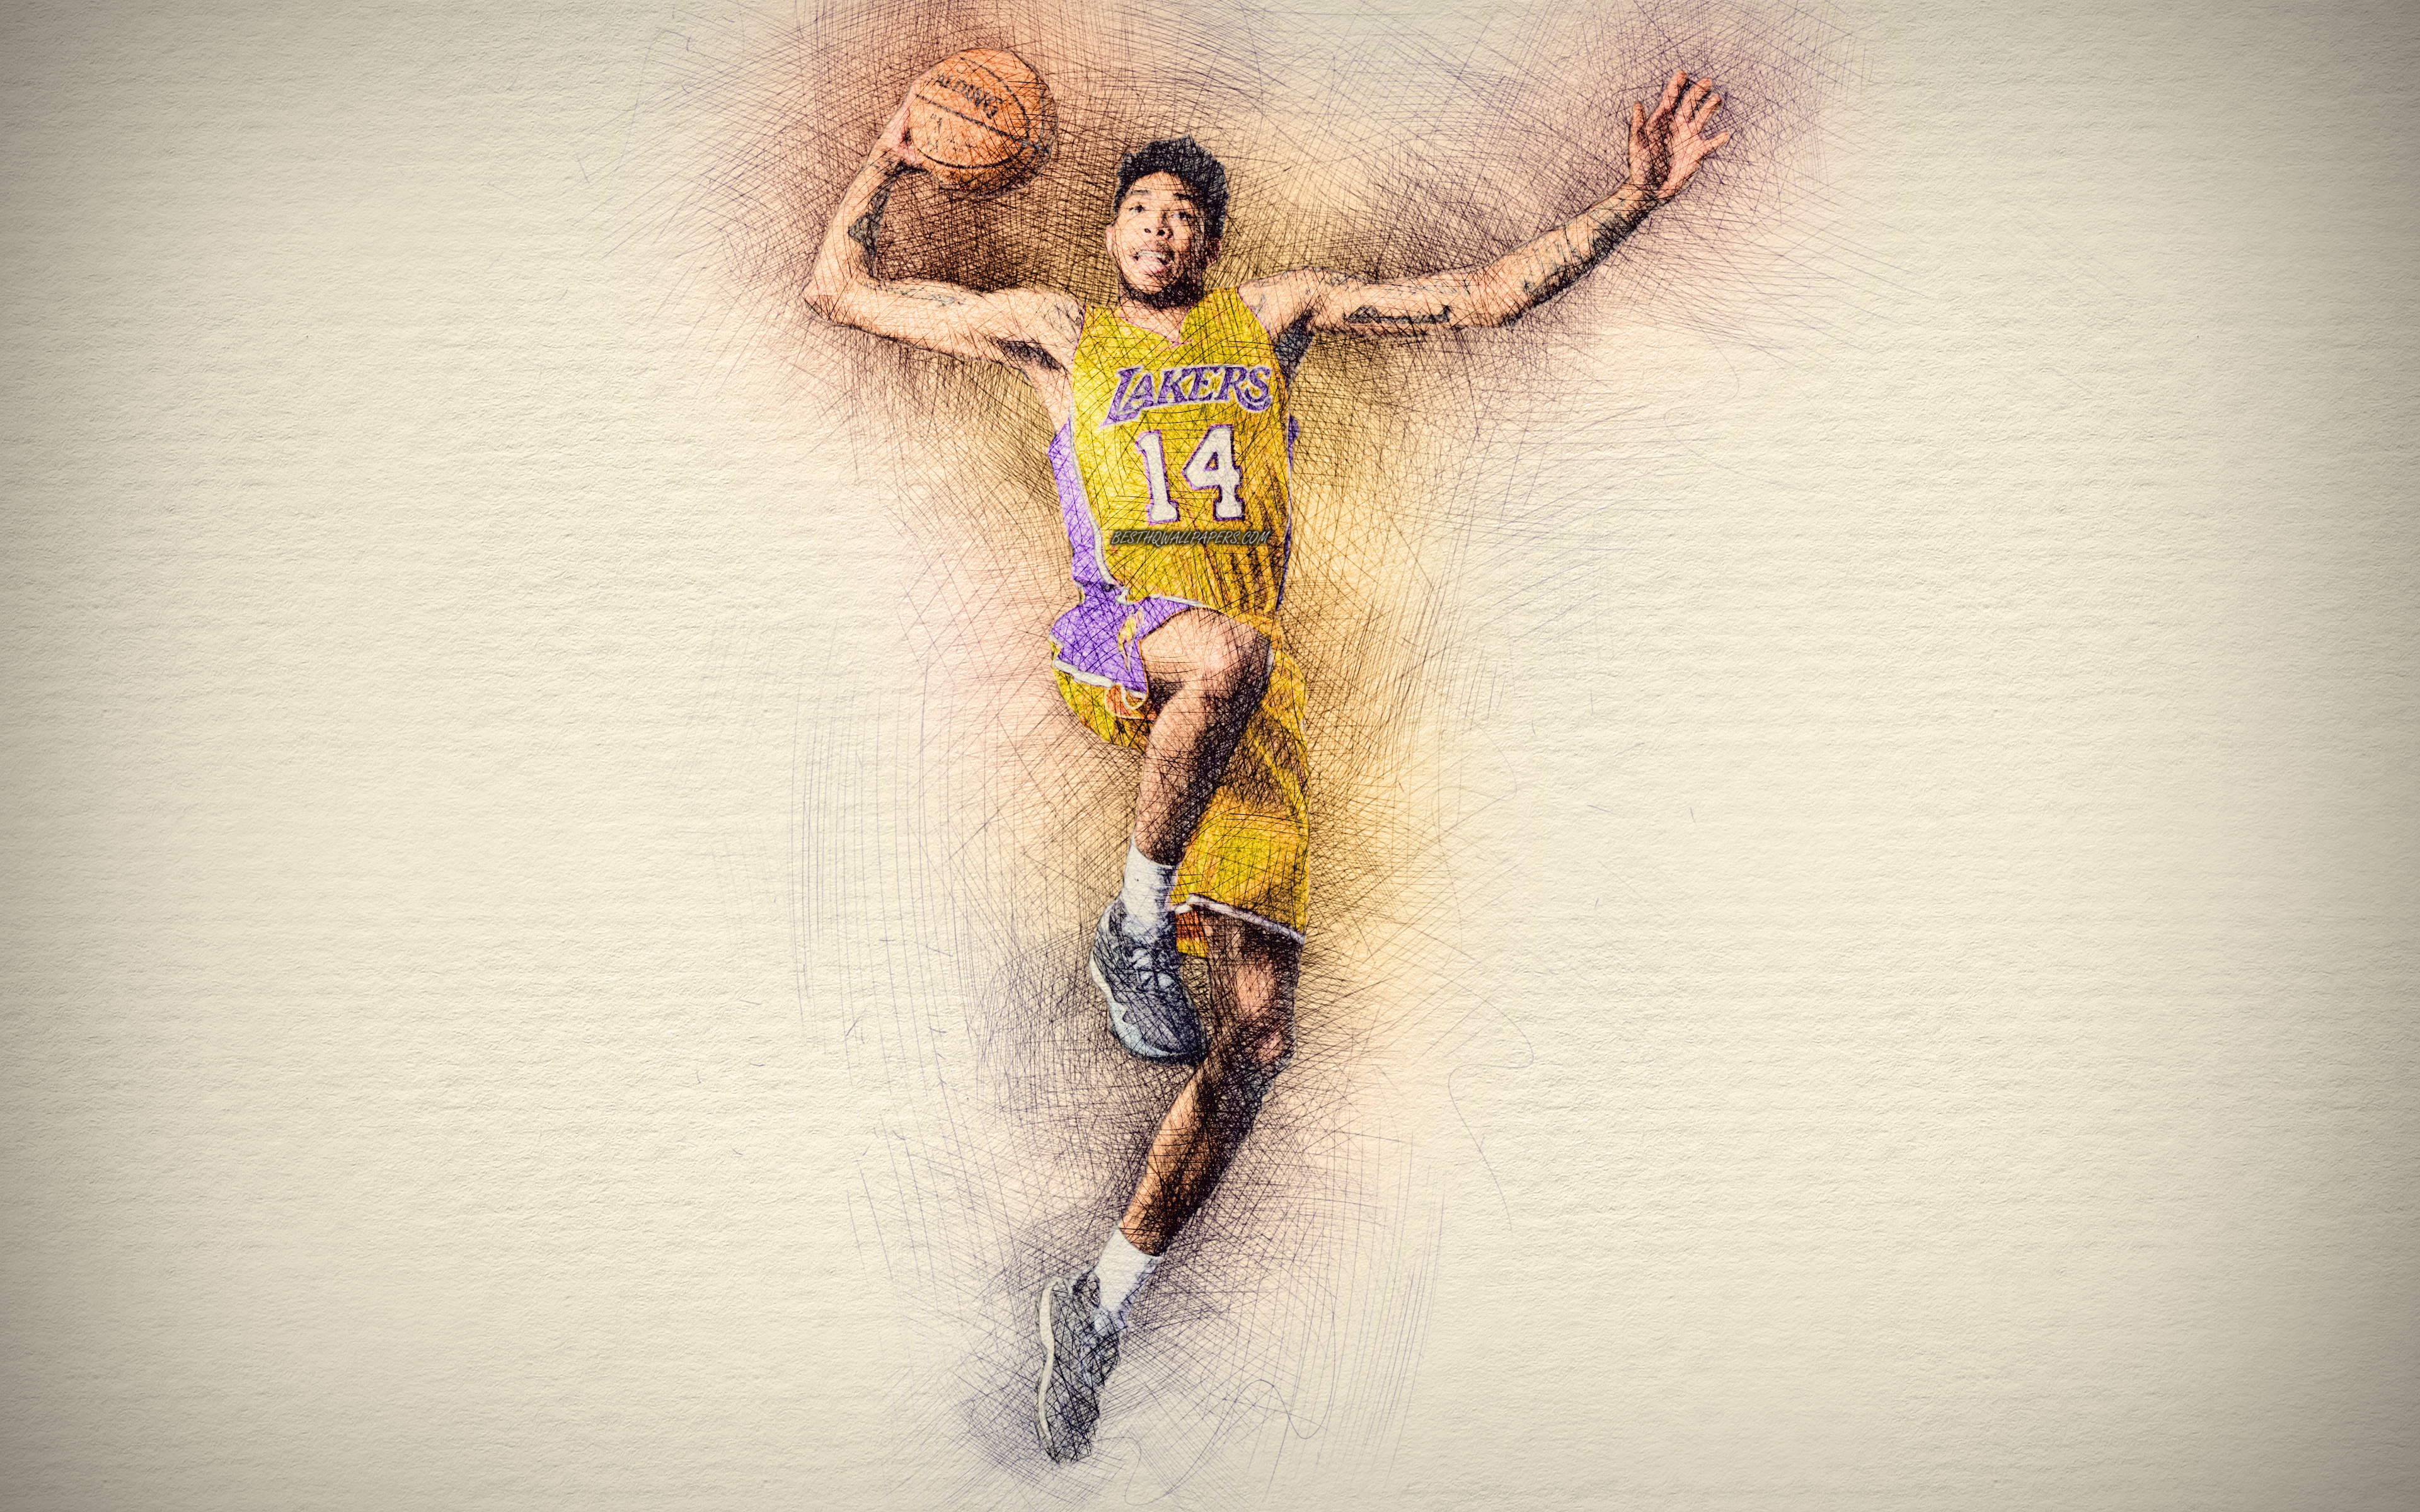 Download wallpapers Brandon Ingram 4k artwork basketball stars 3840x2400